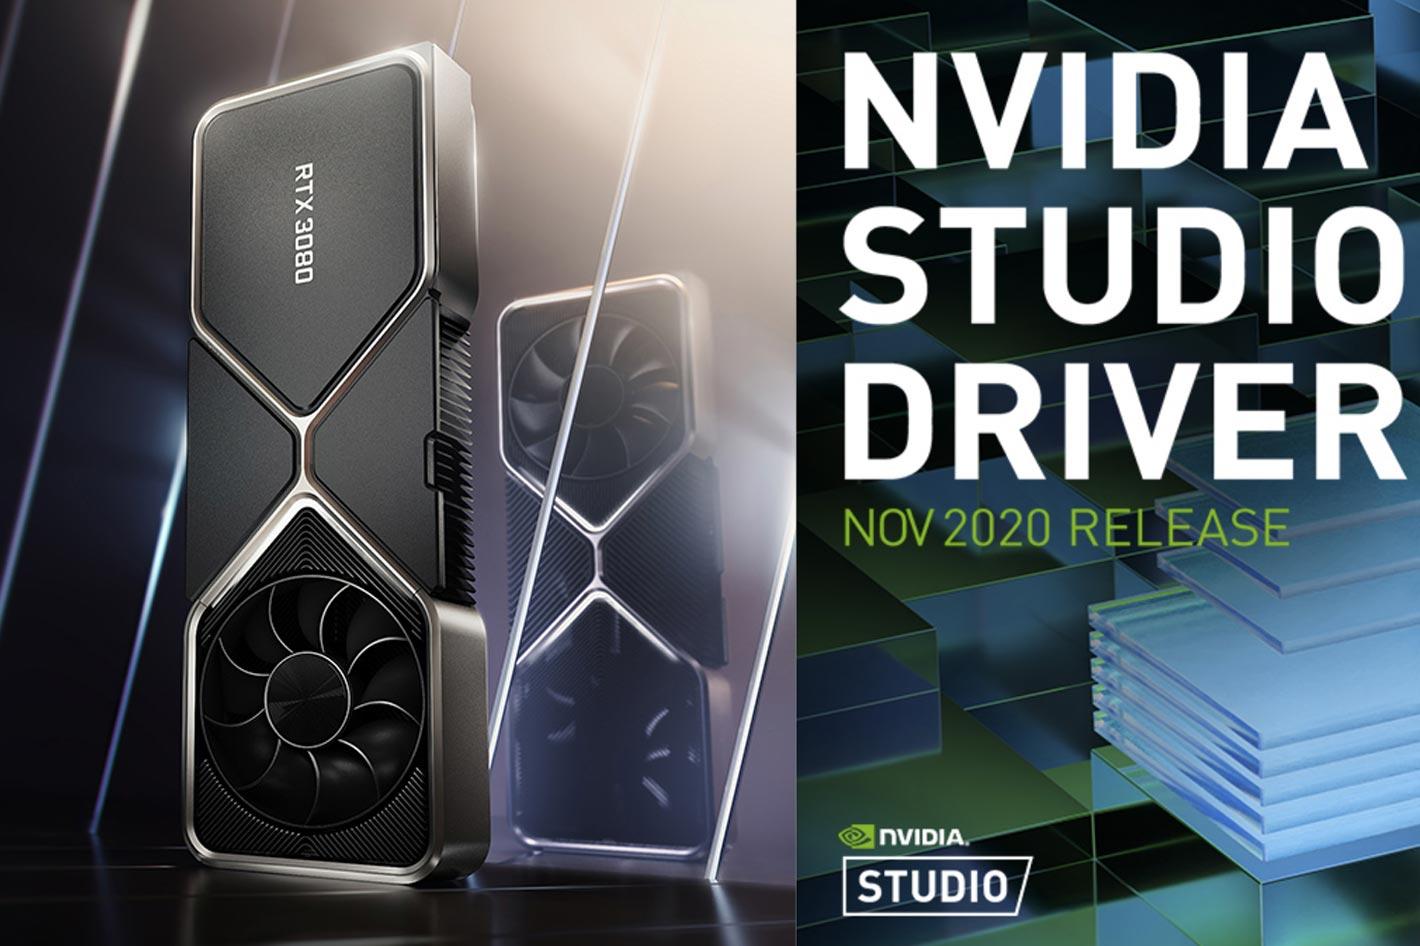 NVIDIA Studio Driver with DaVinci Resolve 17 updates